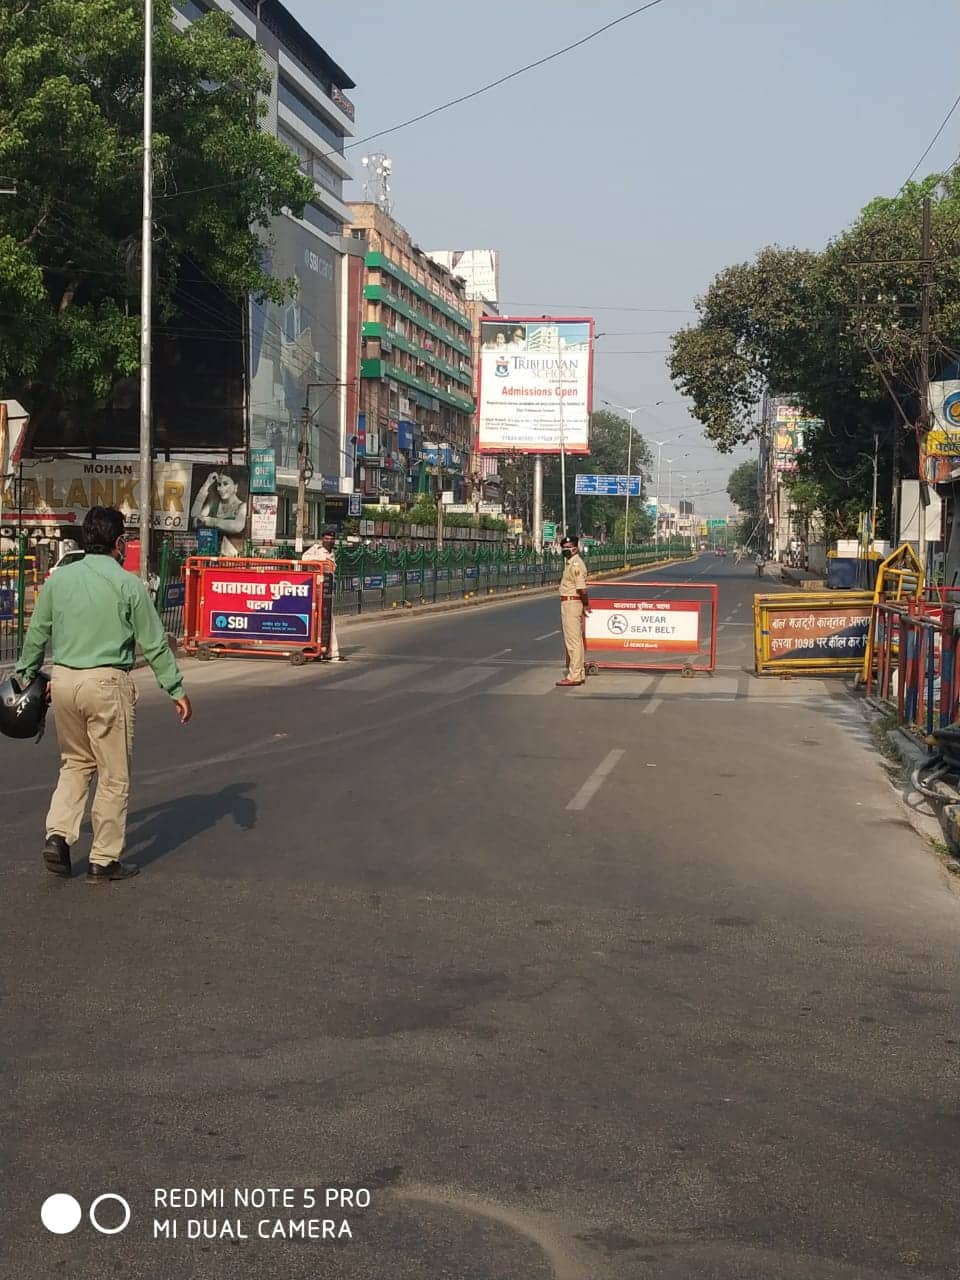 Roads wear deserted look on Day 20 of lockdown